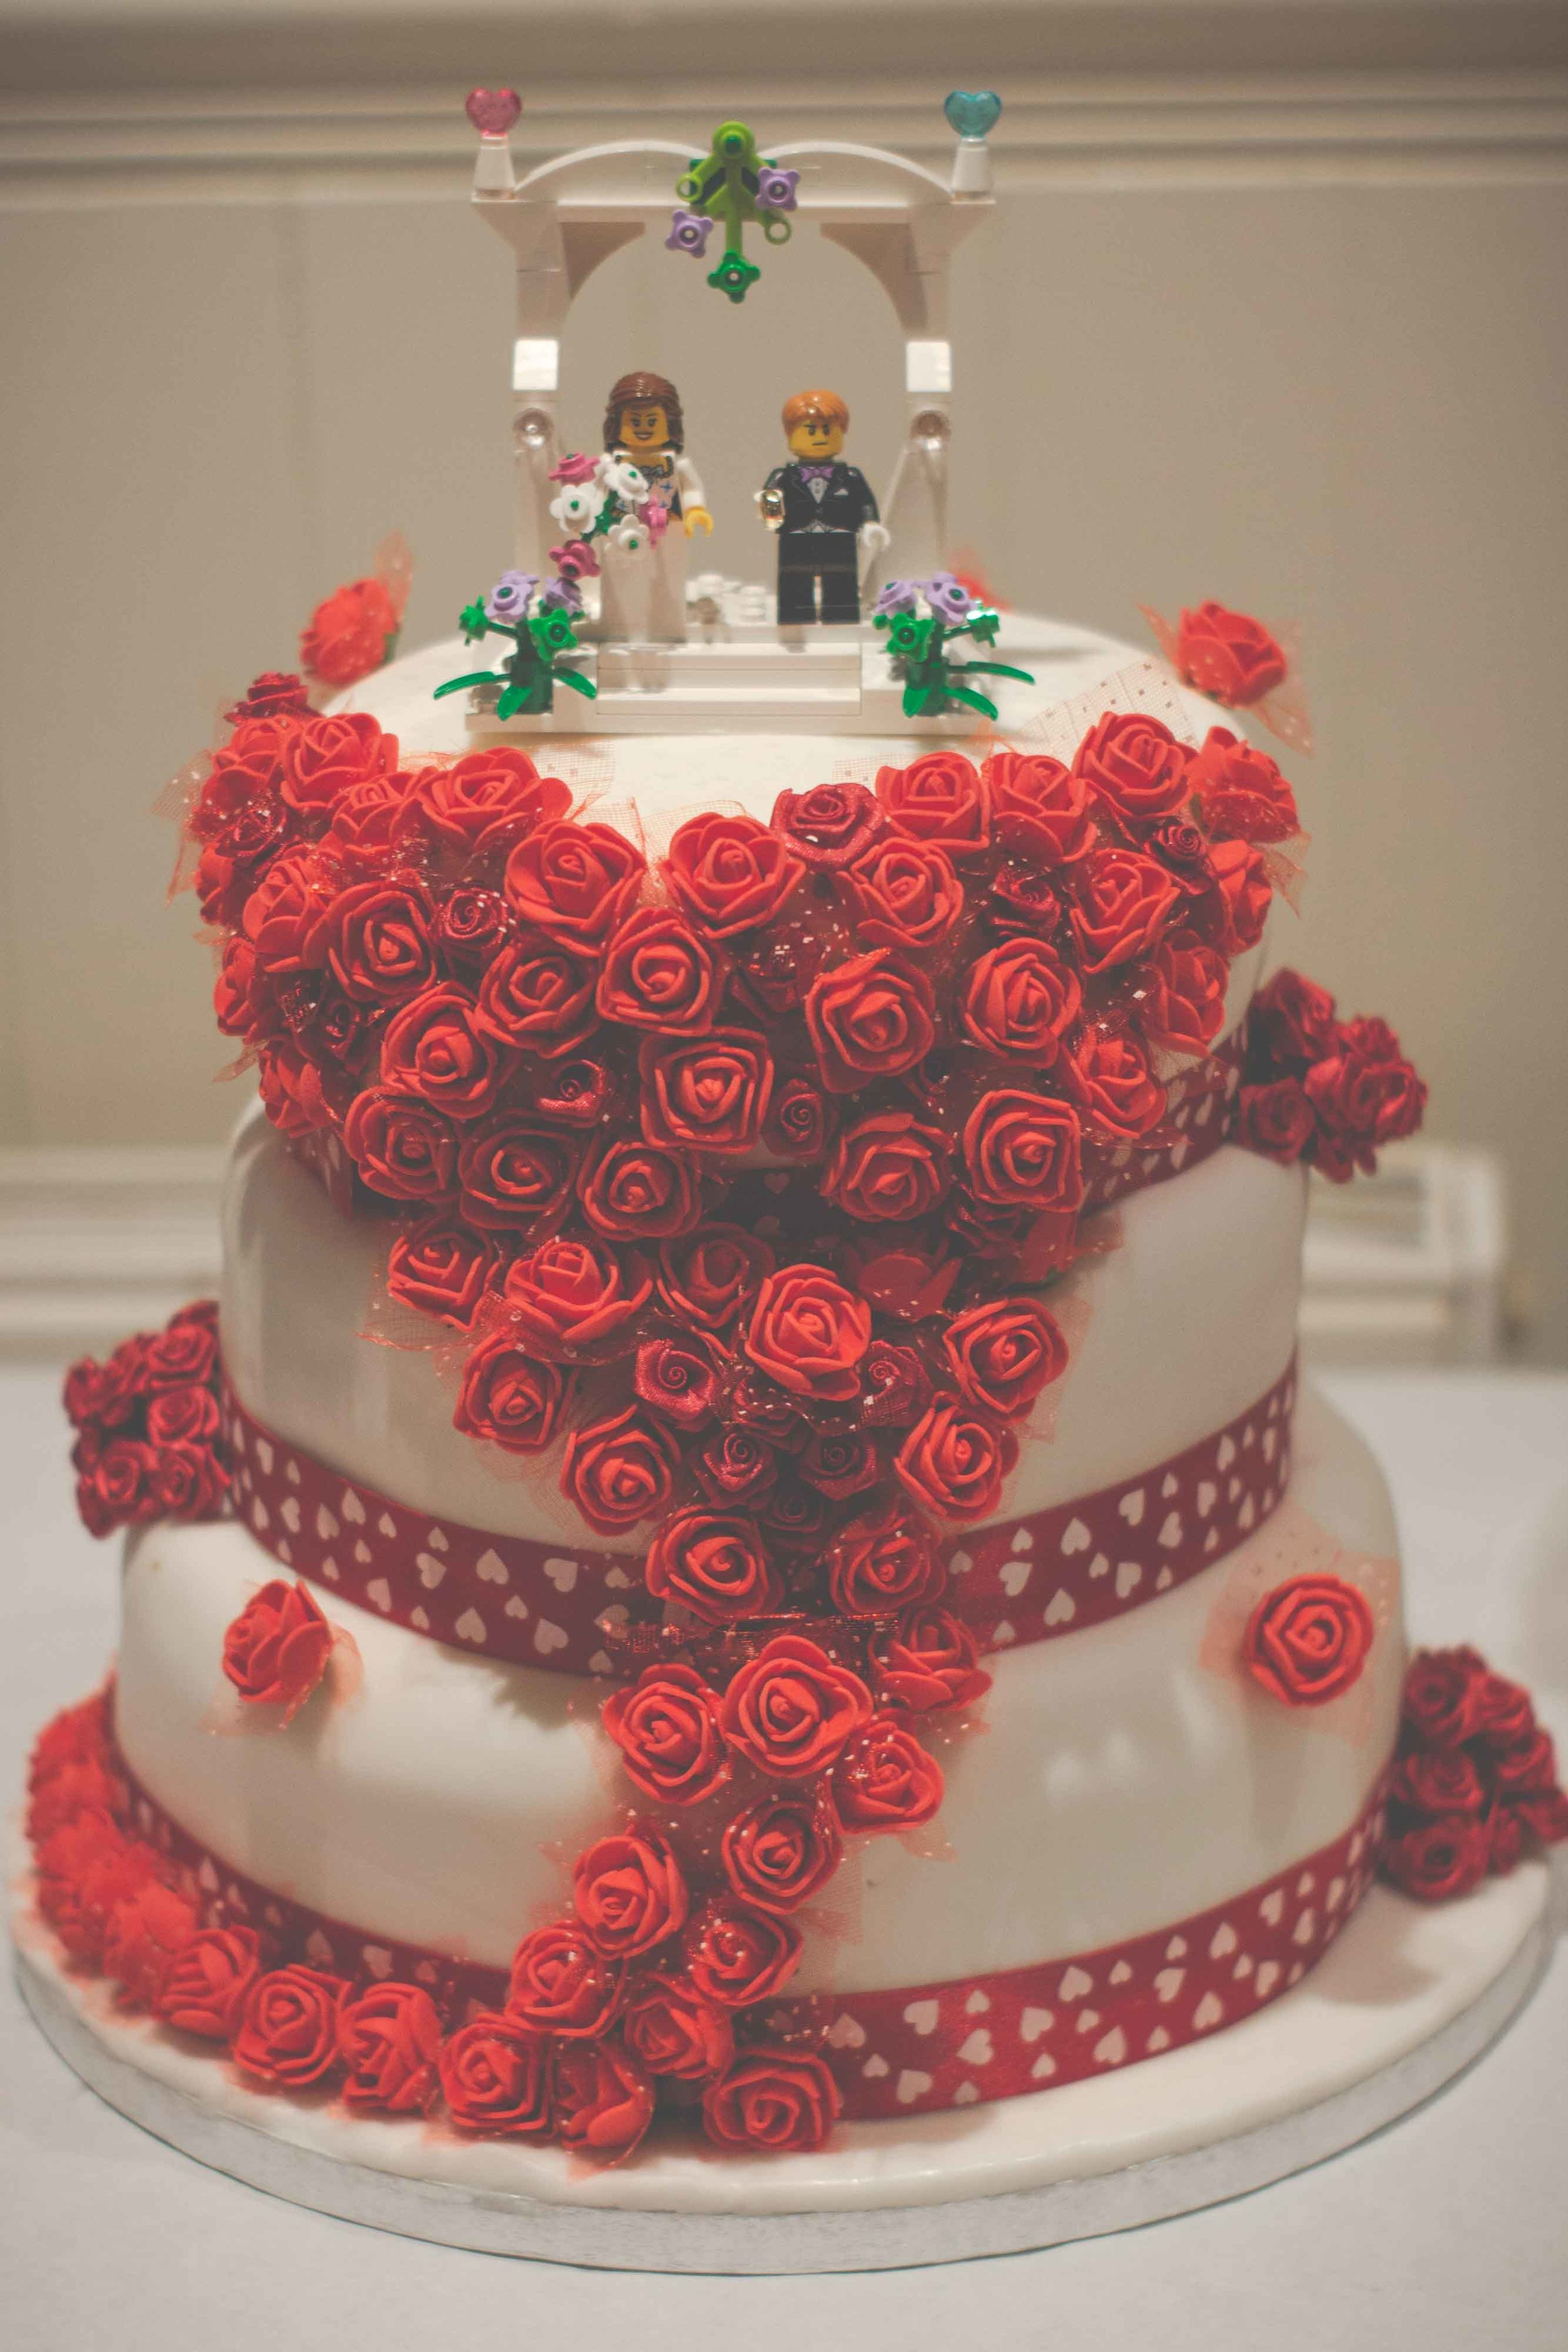 st-johns-ingrow-keighley-wedding-photos-21